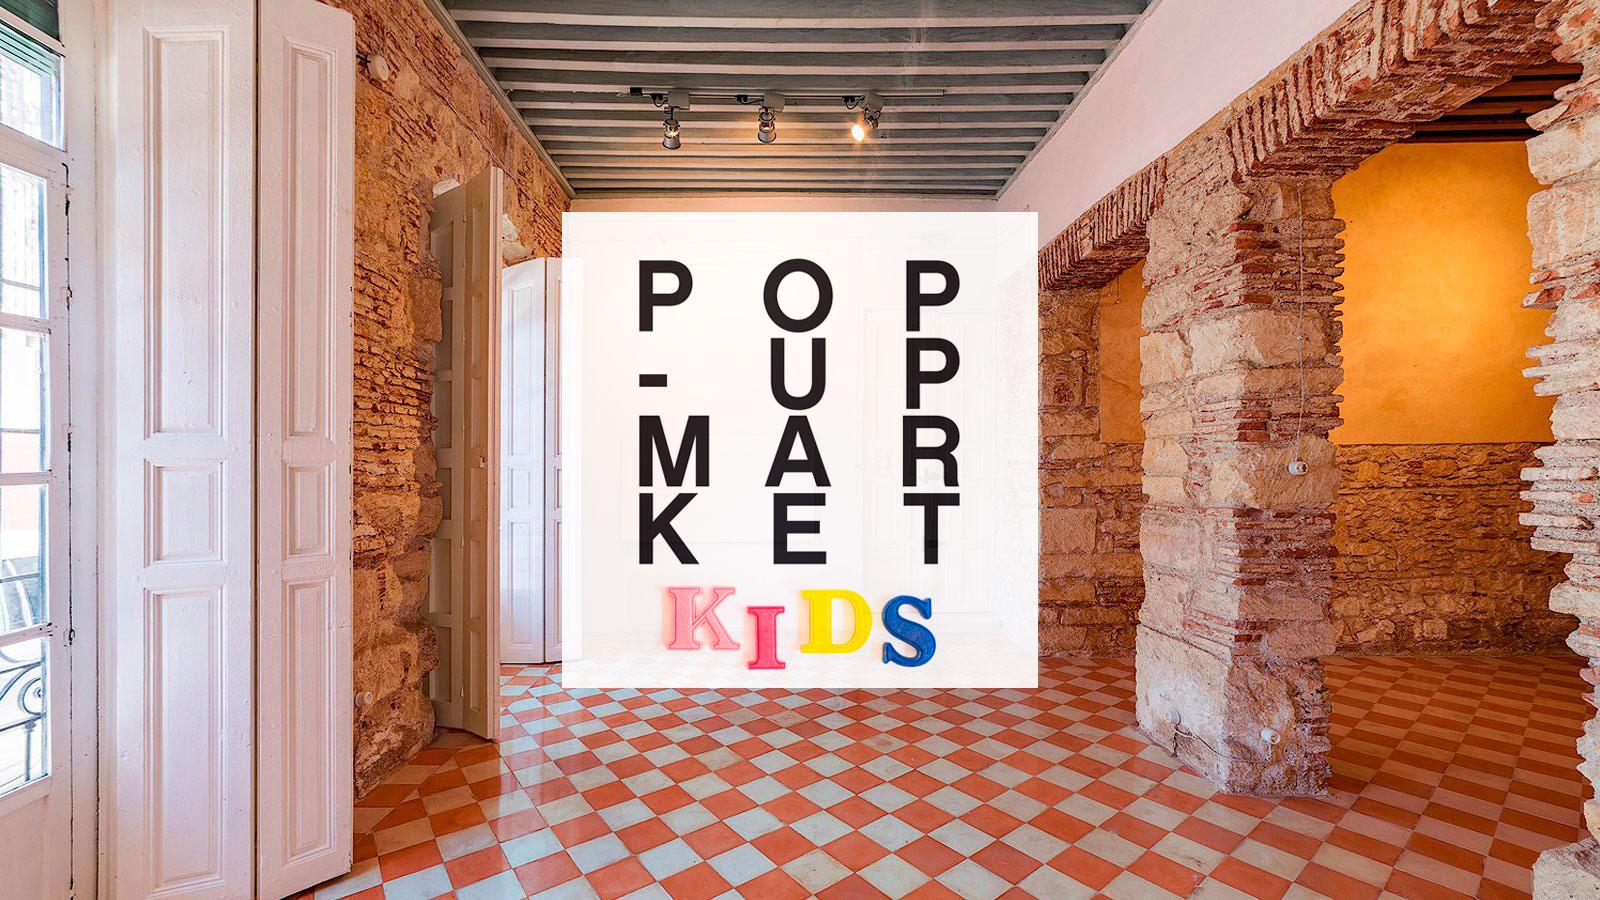 Pop-Up-Market-KIDS